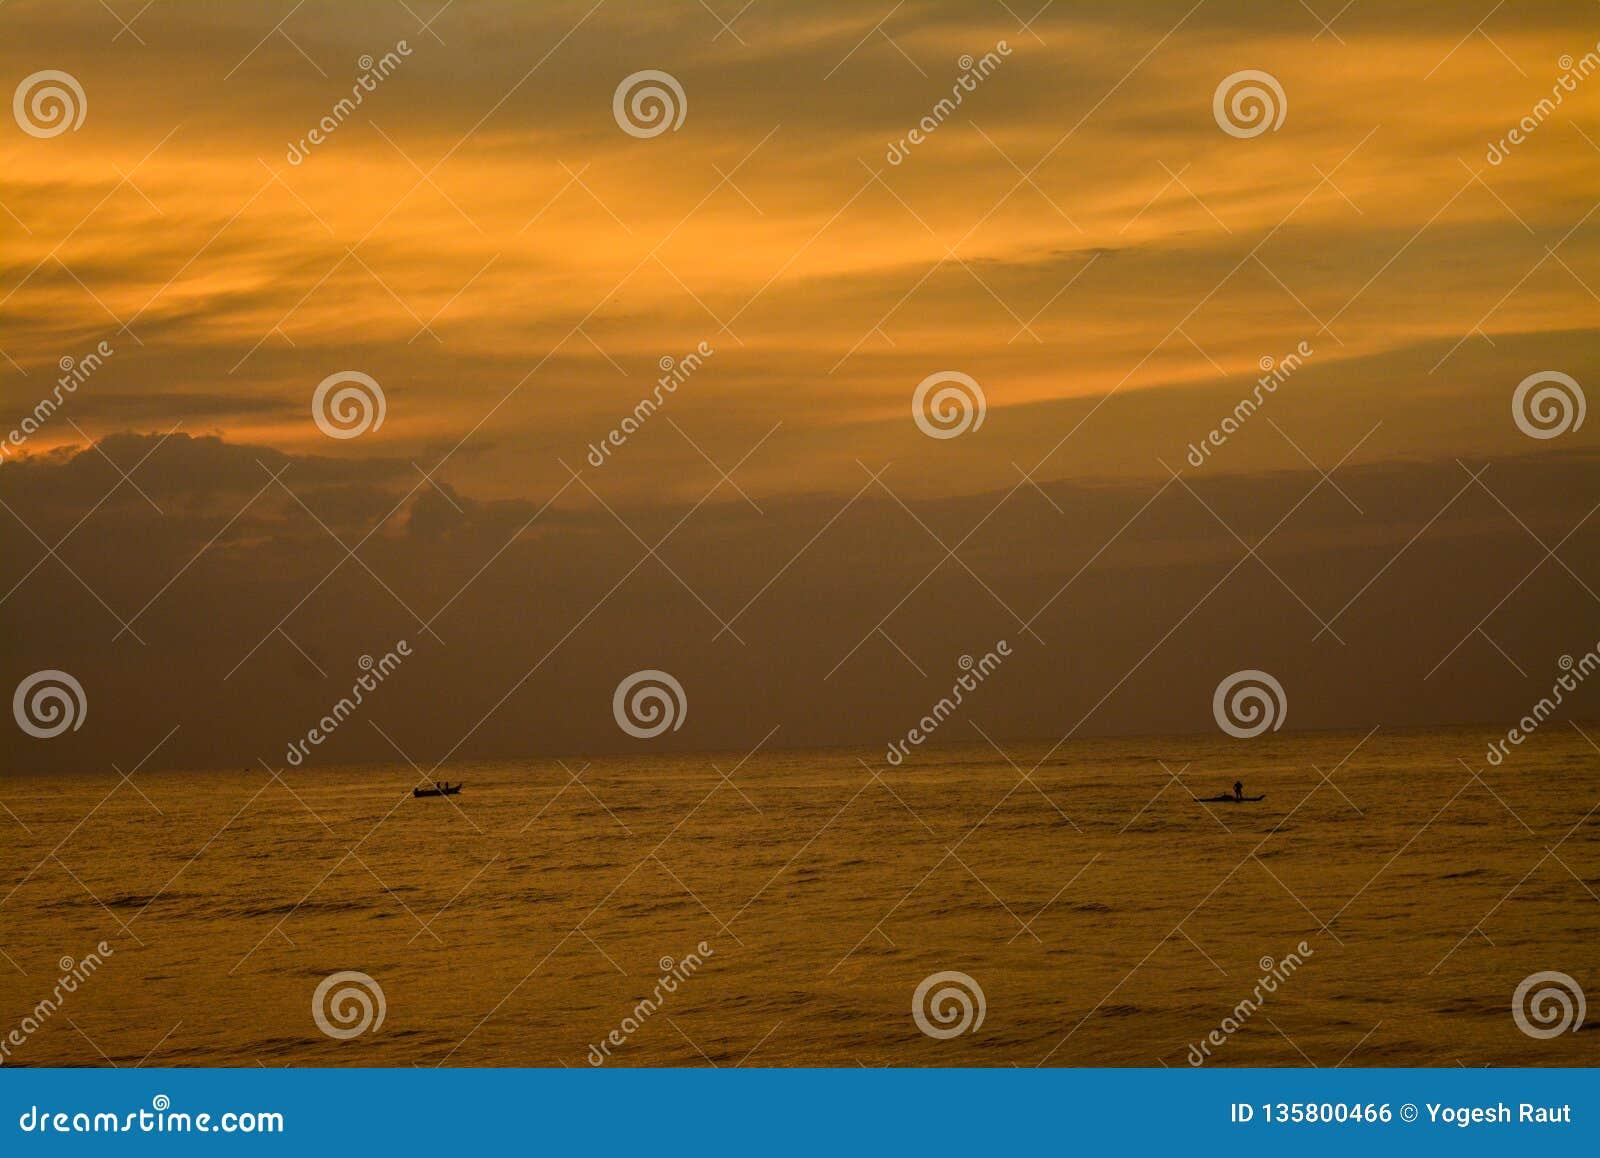 Sonnenaufganghimmelfarben mit Meer